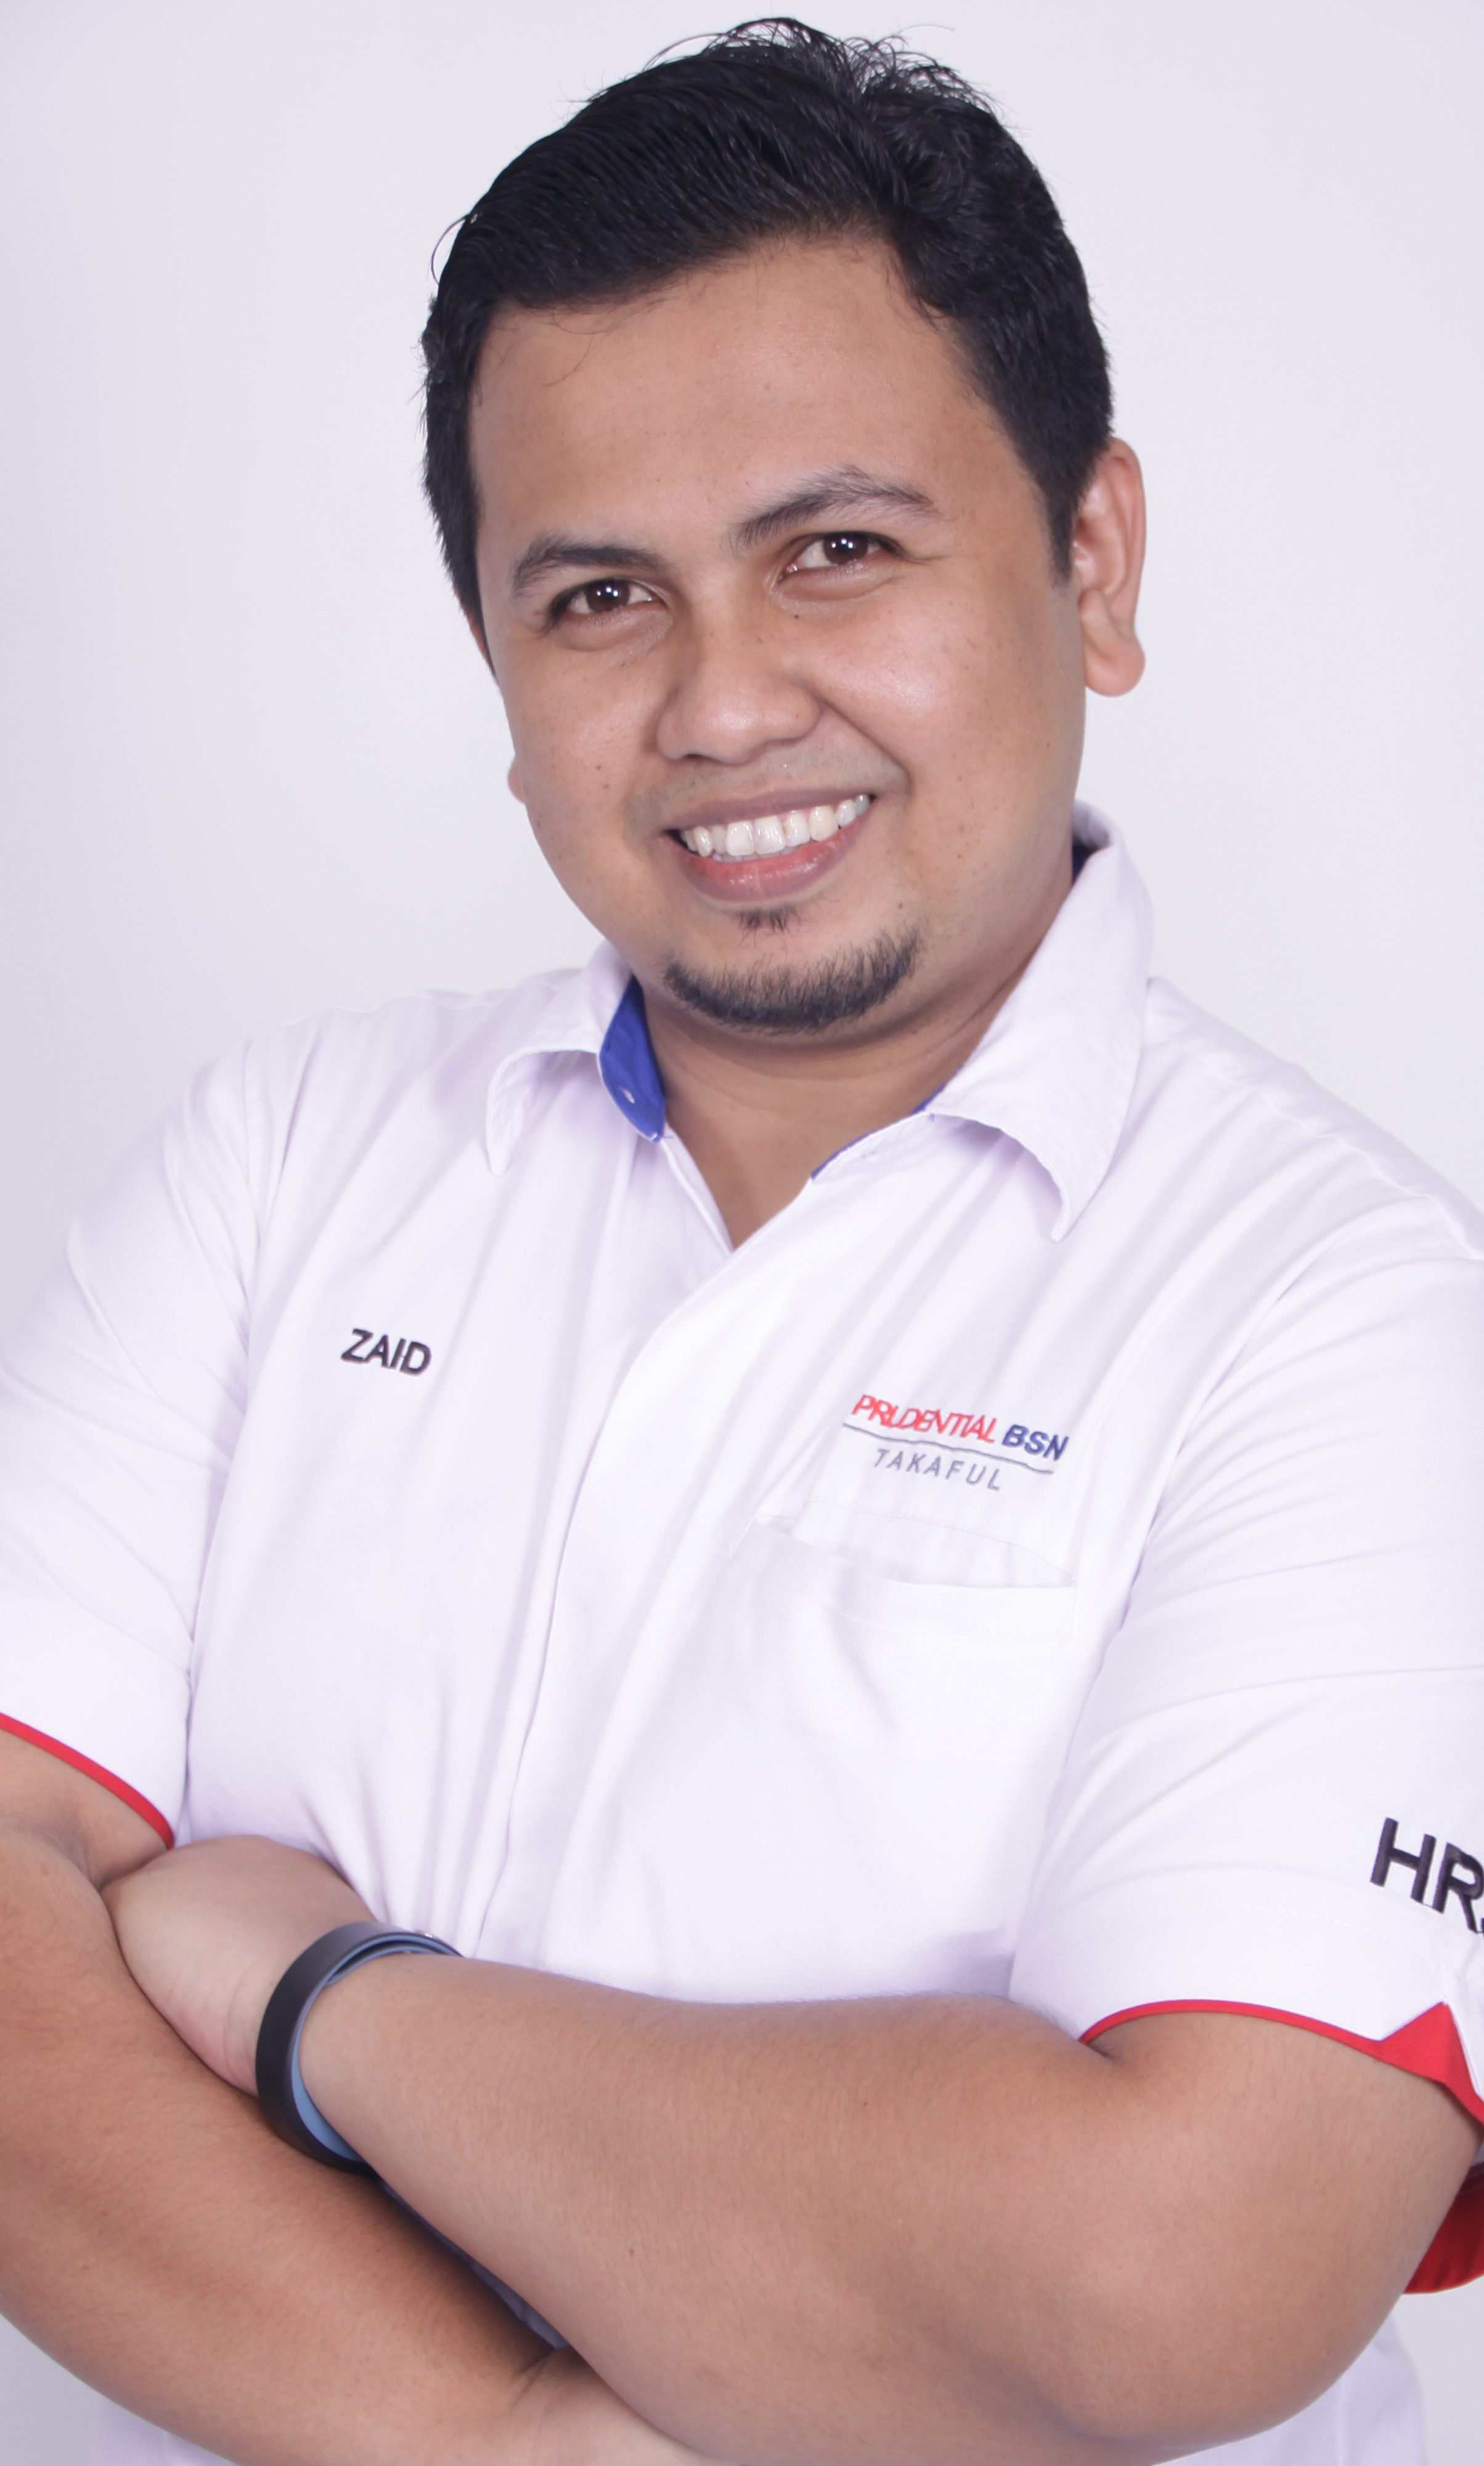 Prudential BSN Takaful Berhad